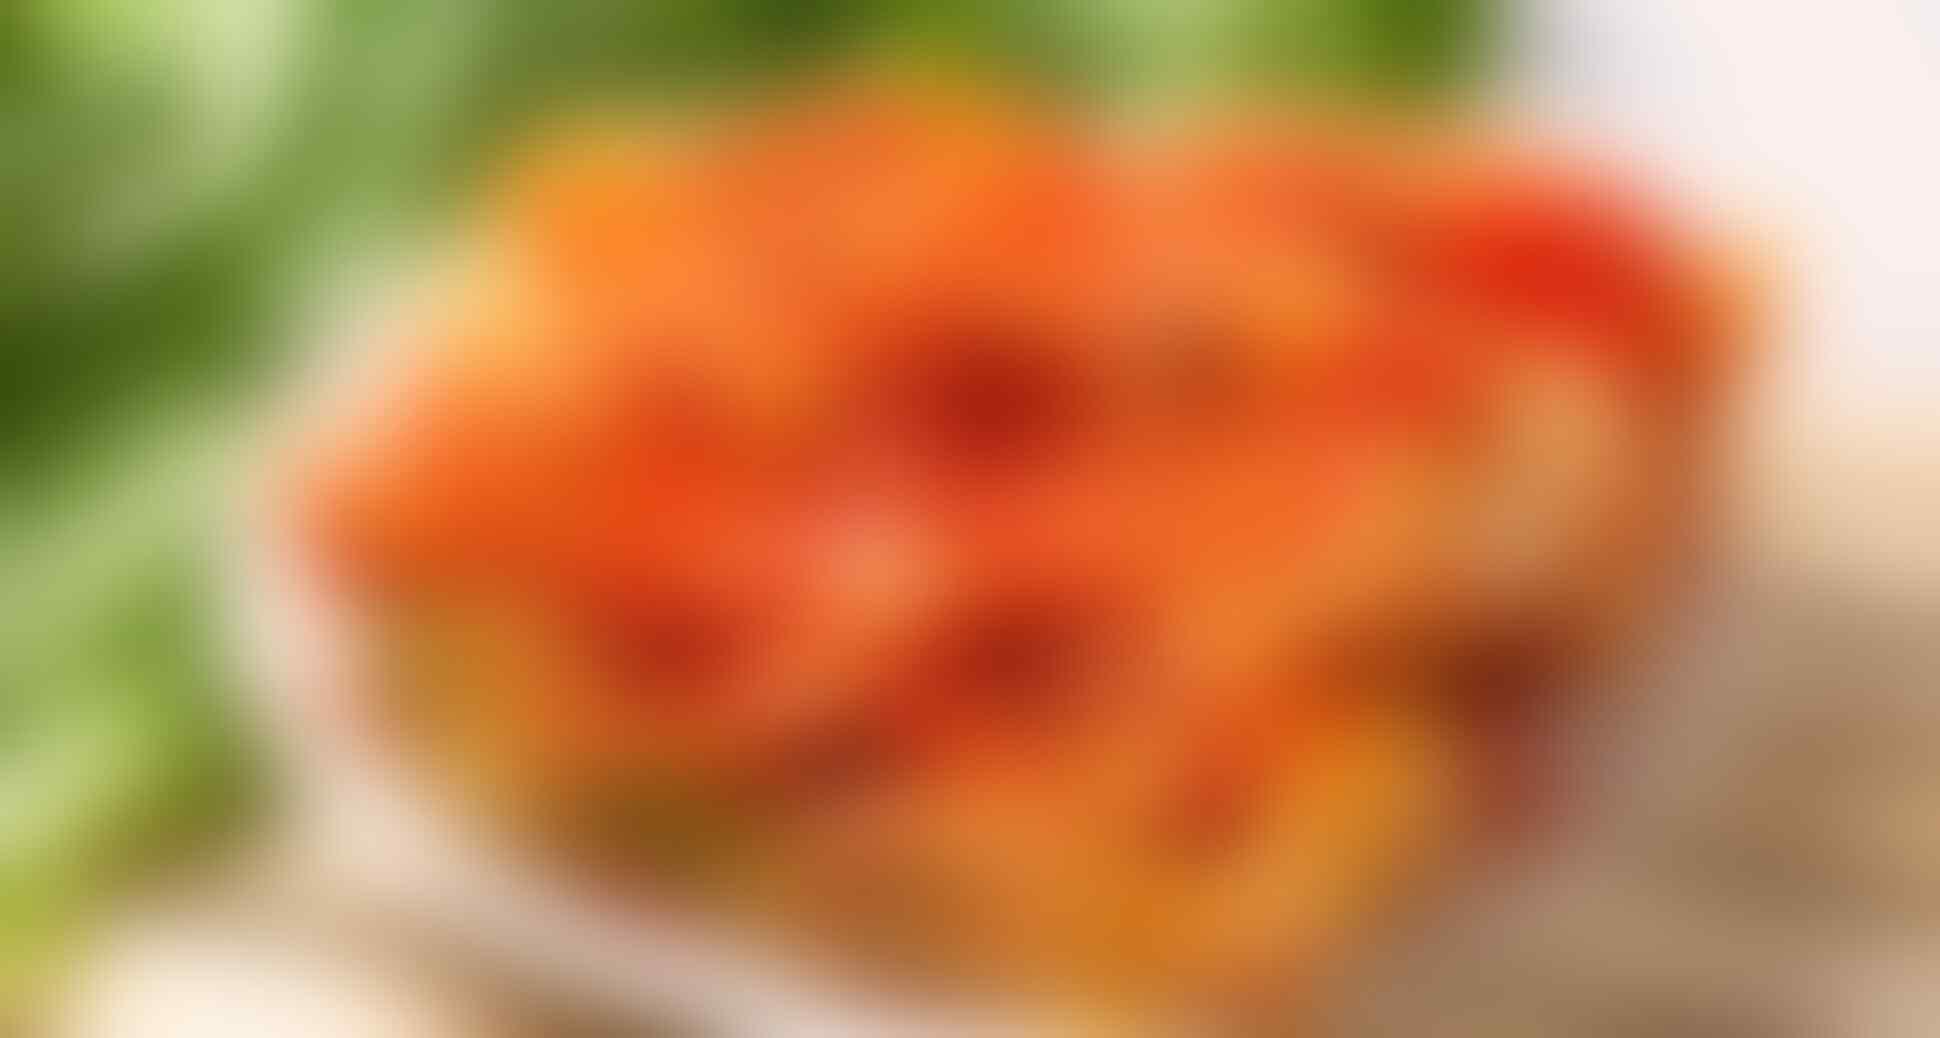 5 Tutorial Bikin Kimchi Anti-Mainstream Ala Youtuber Korea Maangchi